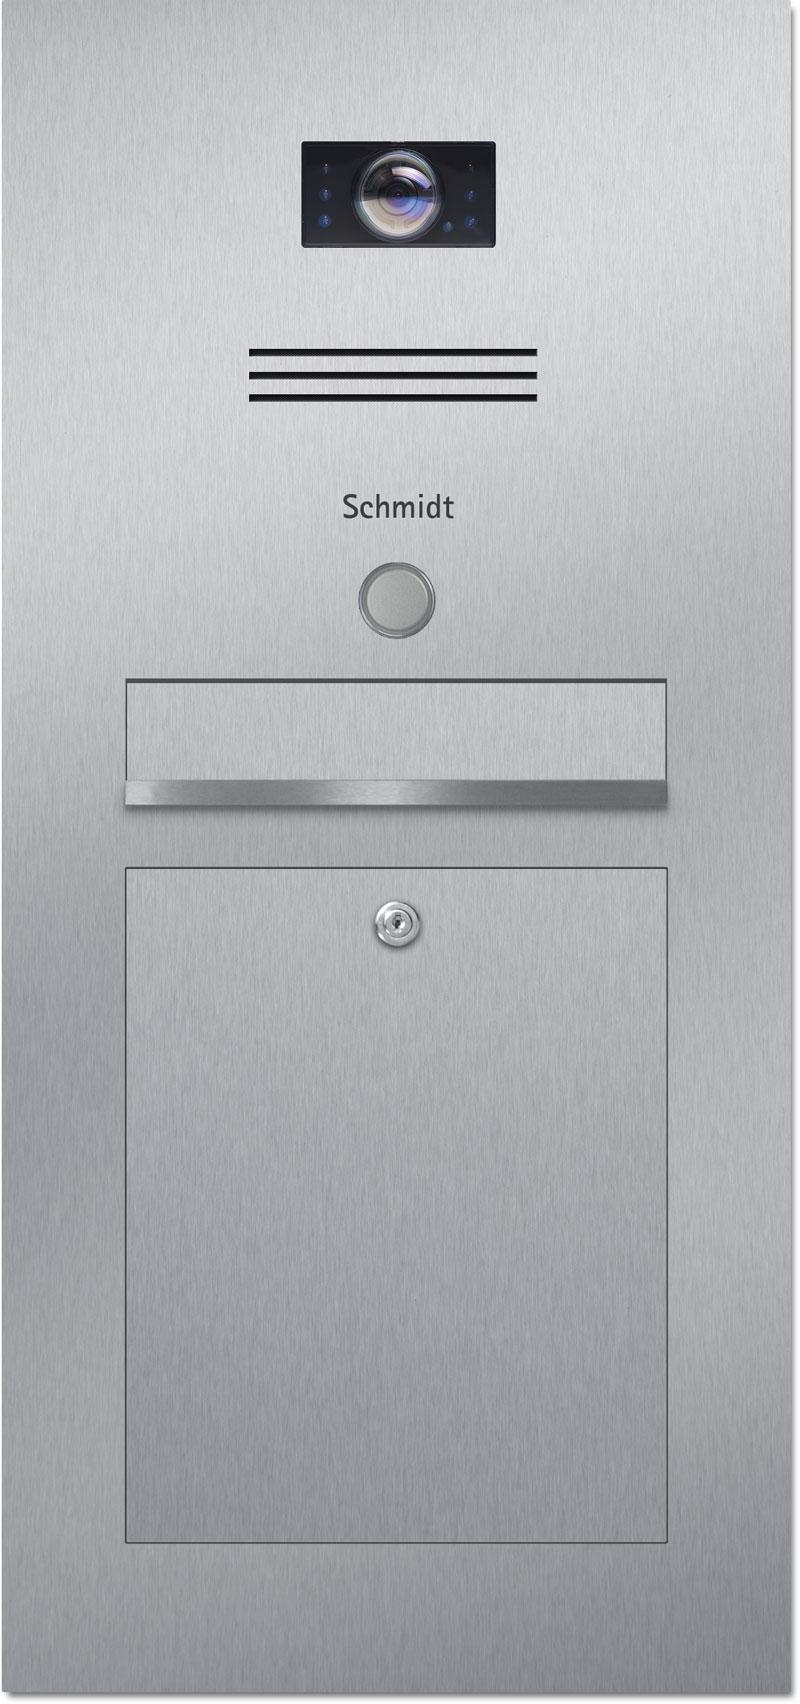 Türsprechanlage Edelstahl Konfigurator Busch-Jaeger Beschriftung Klingel